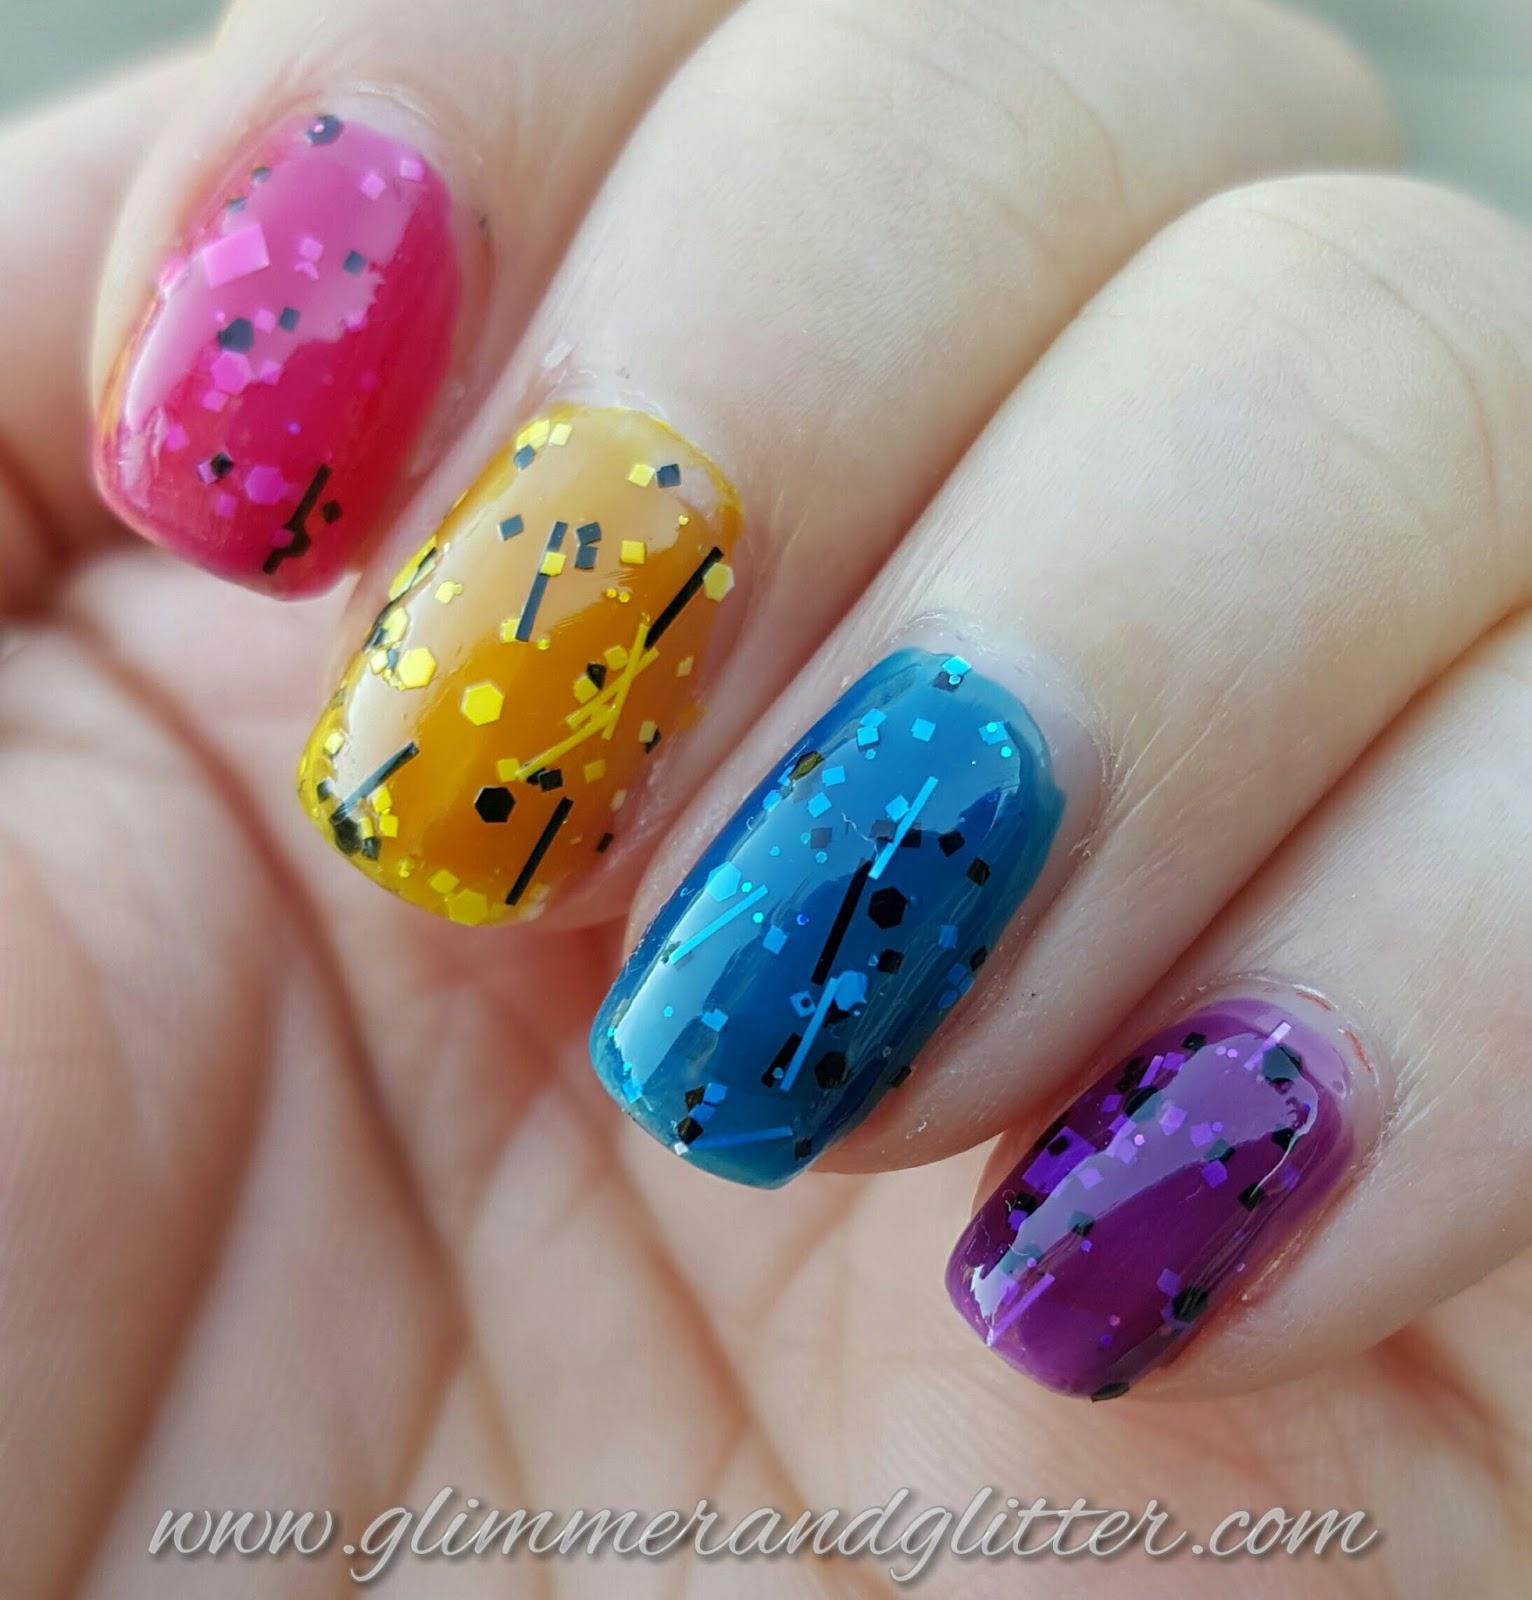 Glimmer and Glitter - A Nail Polish Blog